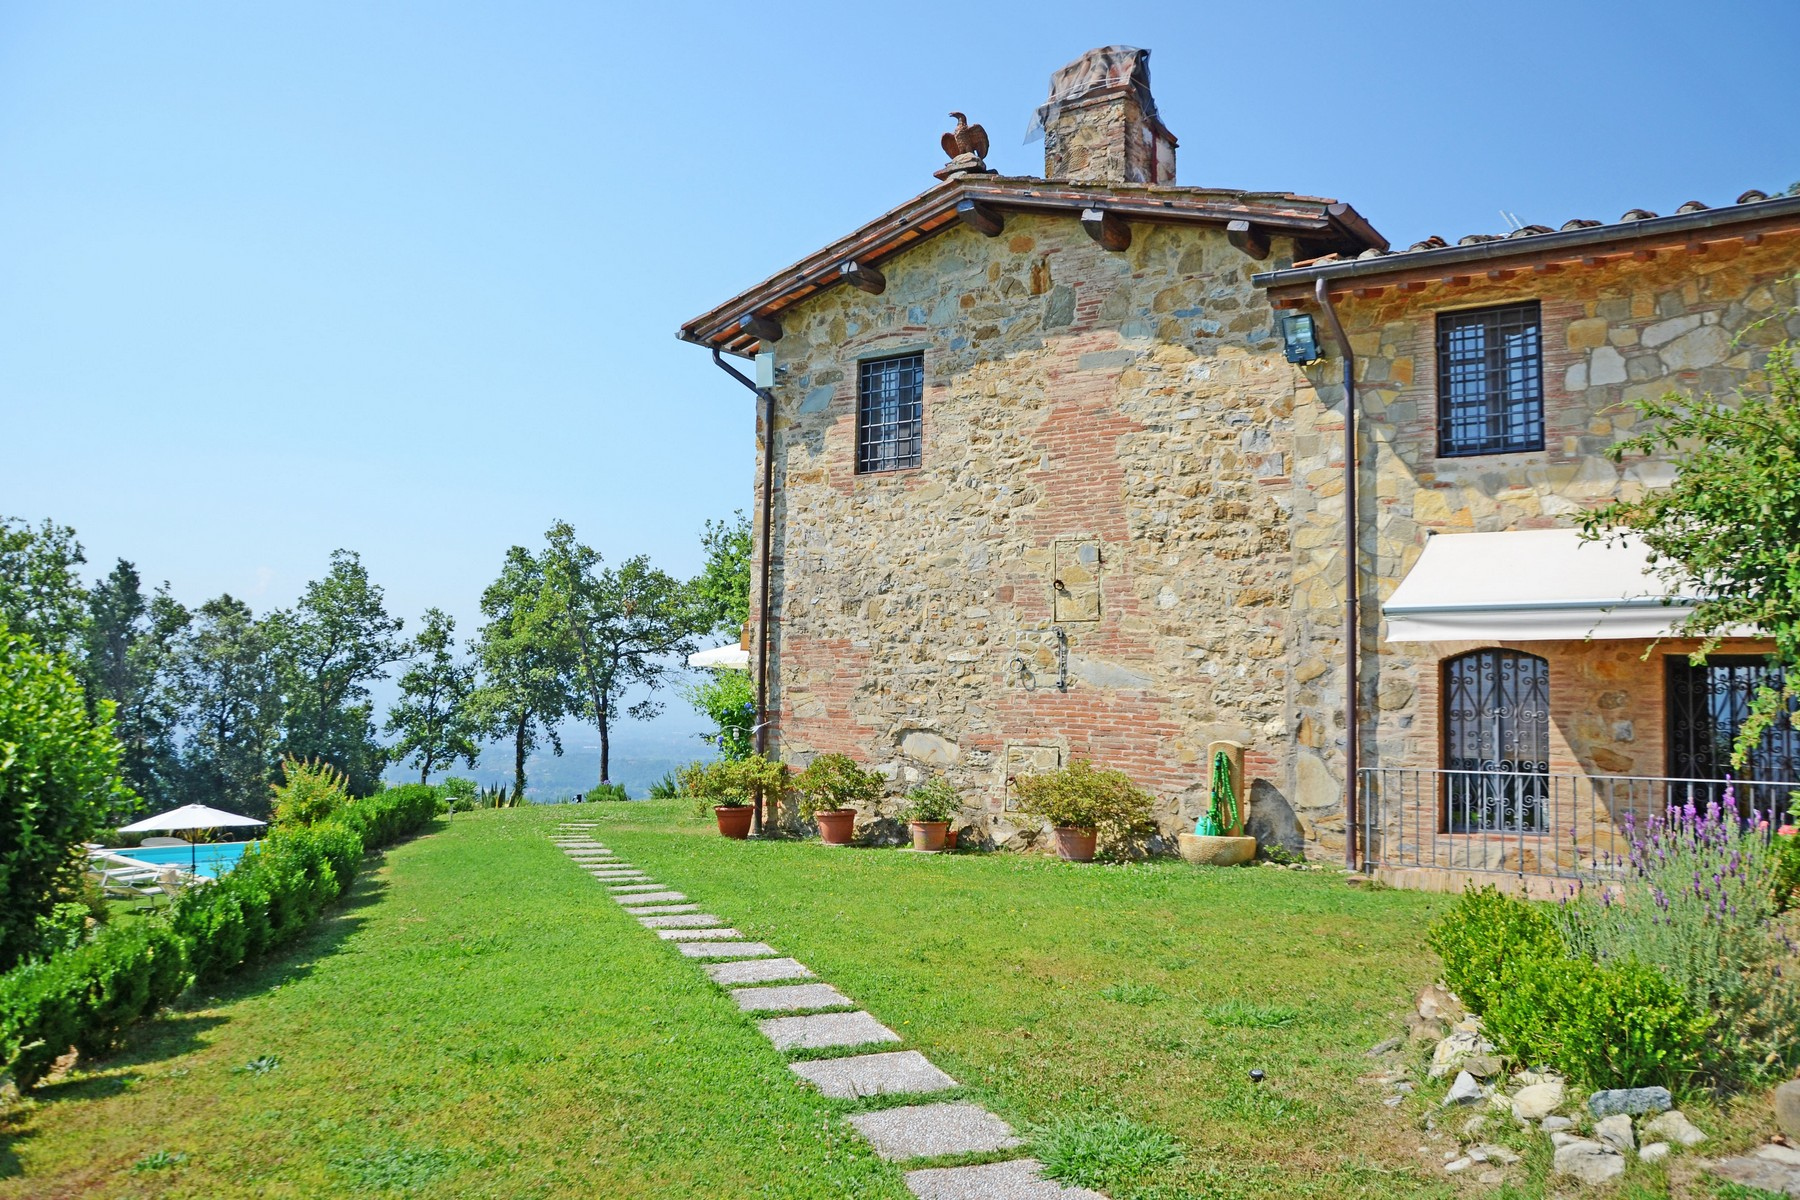 Rustico in Vendita a Lucca: 5 locali, 210 mq - Foto 4